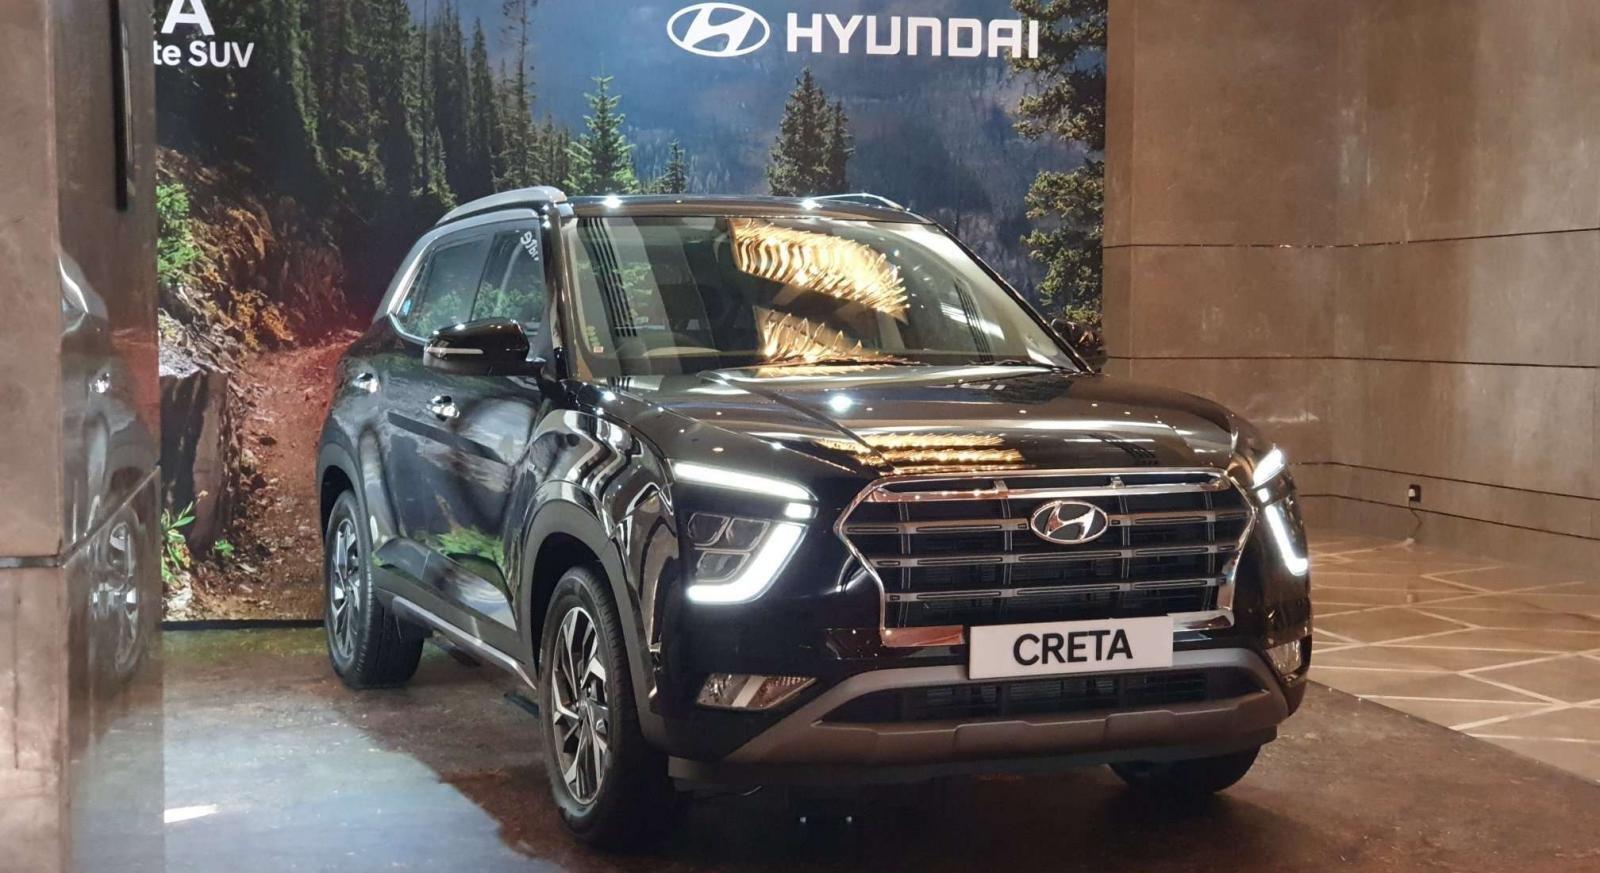 2020 Hyundai Creta SUV launch India